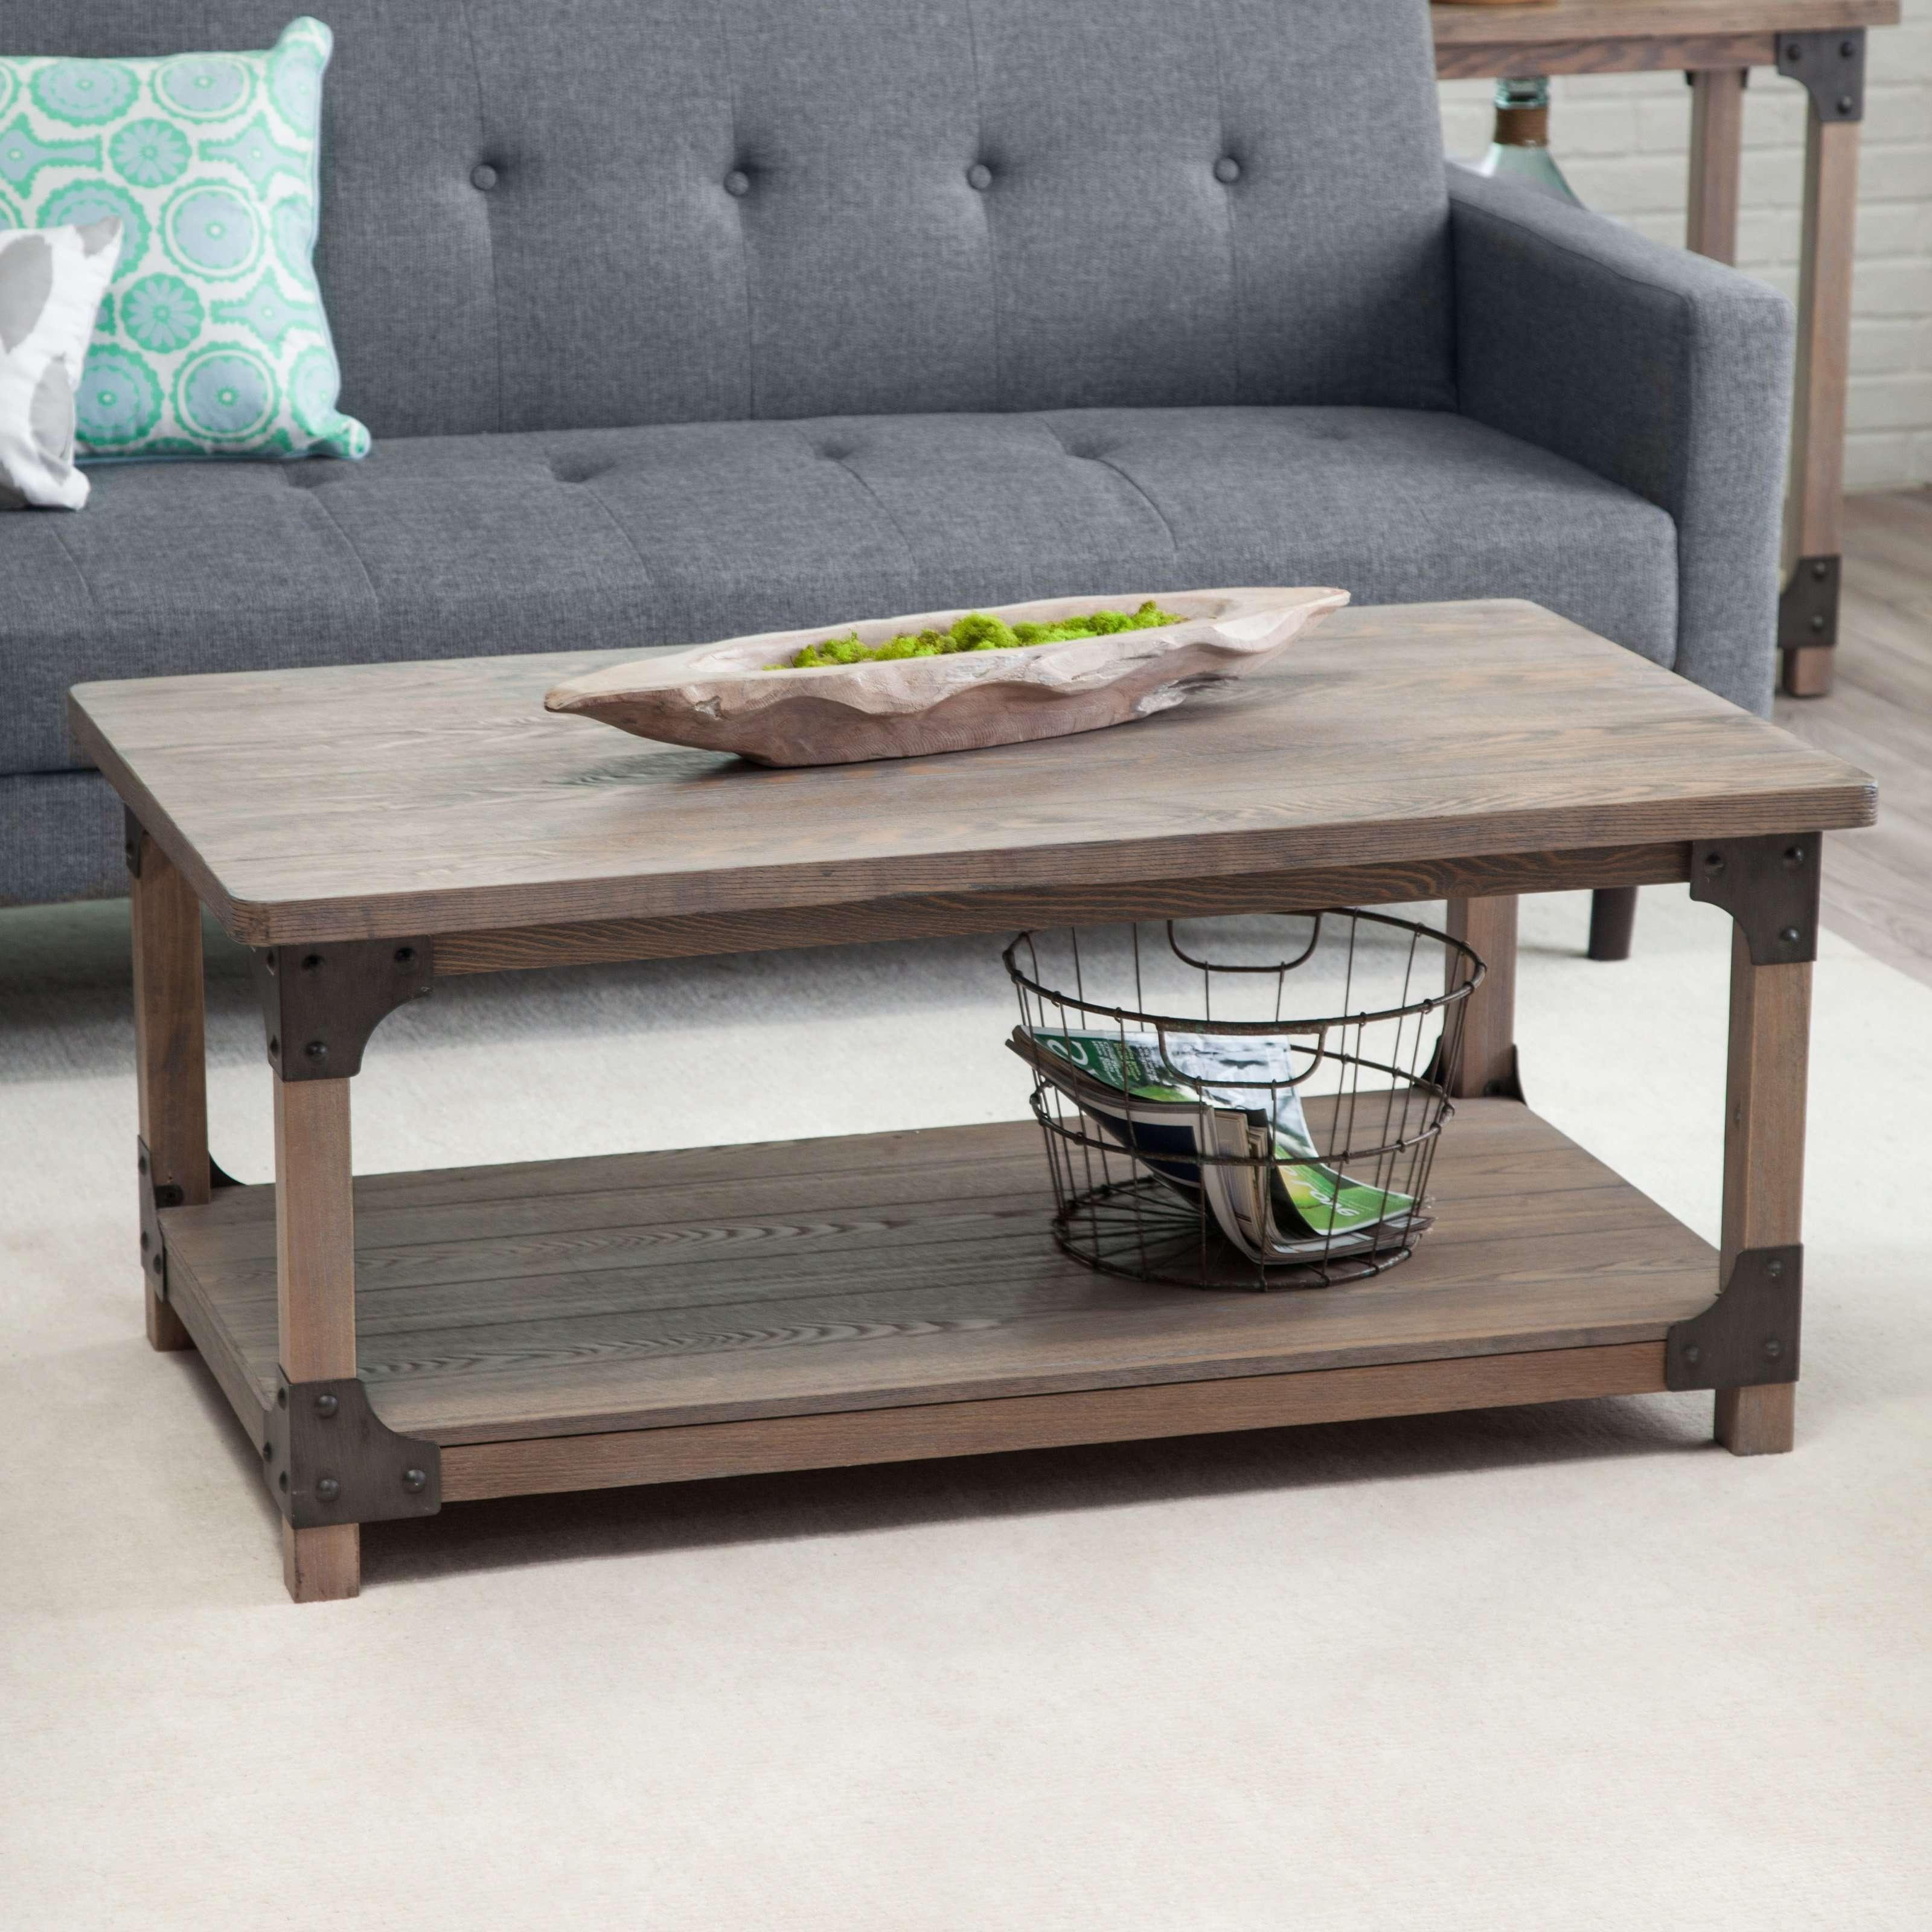 Belham Living Edison Reclaimed Wood Coffee Table (View 3 of 20)